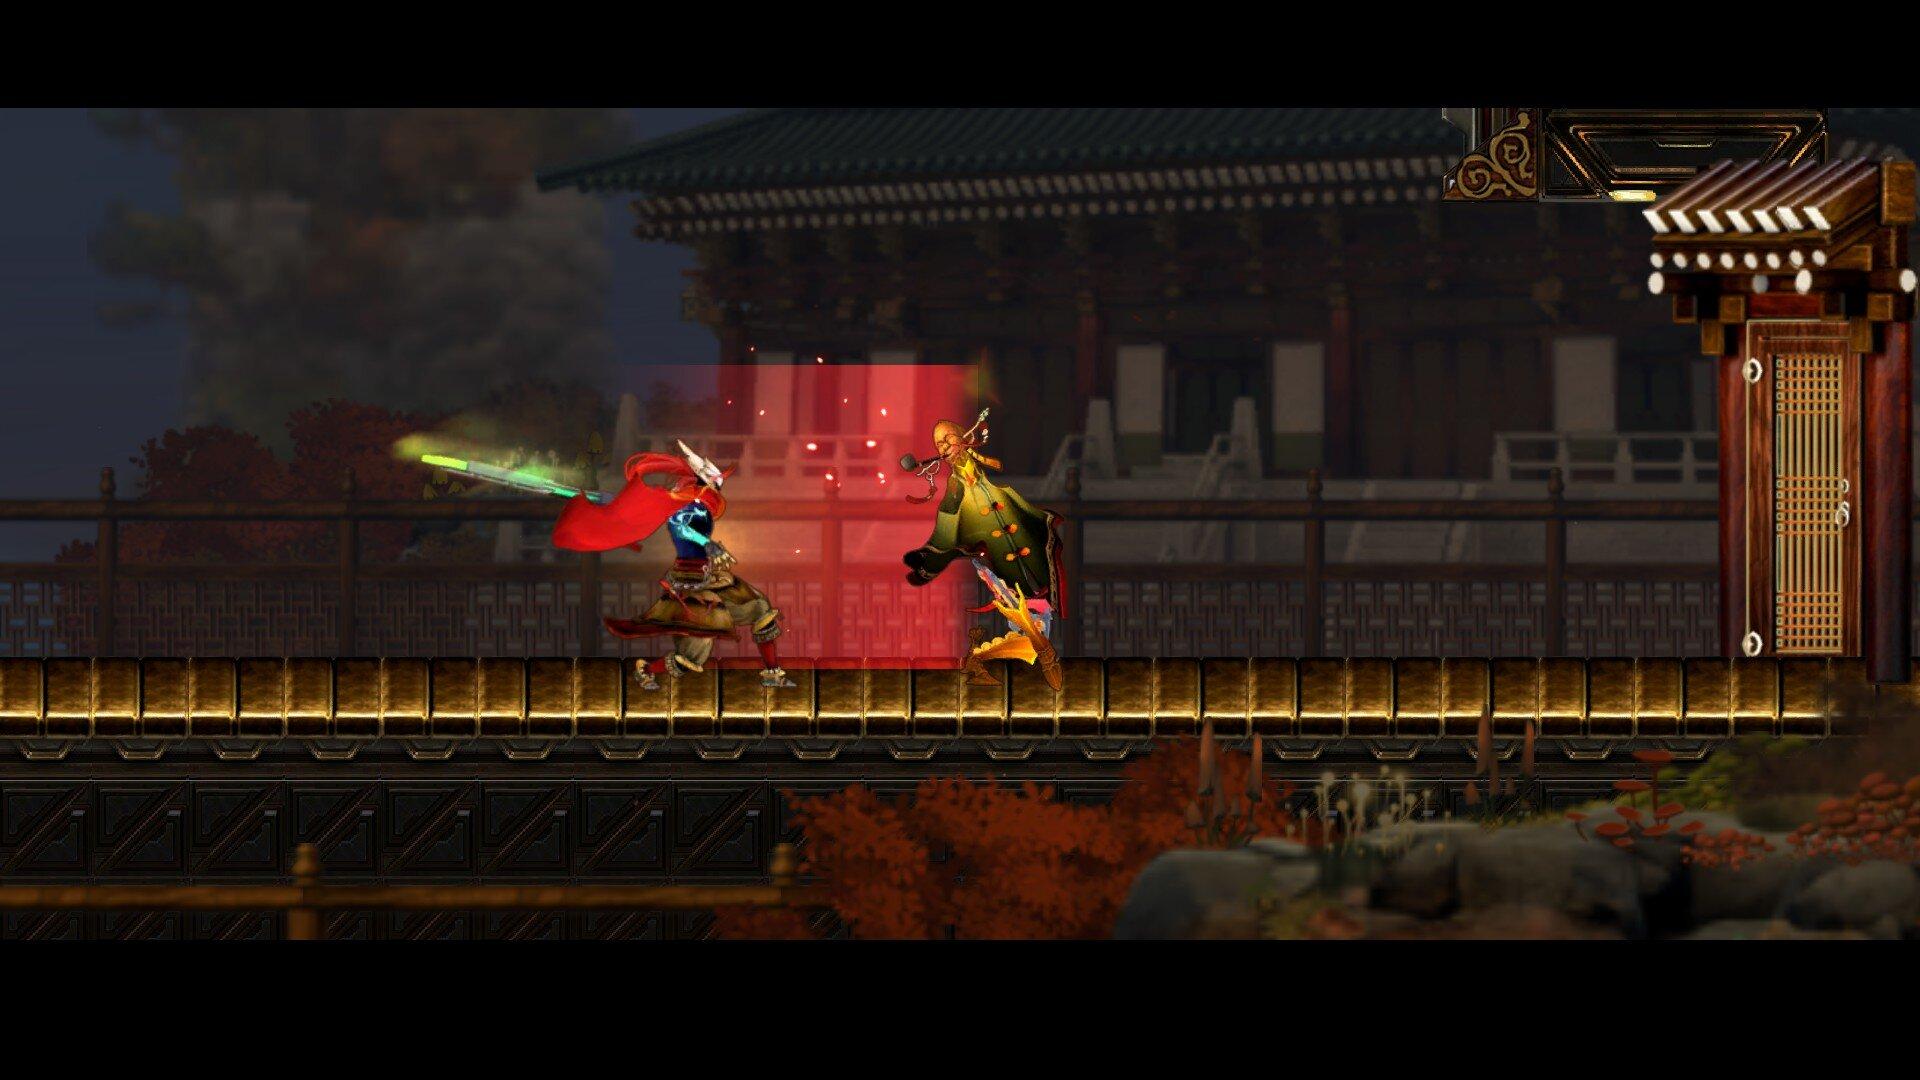 Karma Knight game screenshot, fight scene